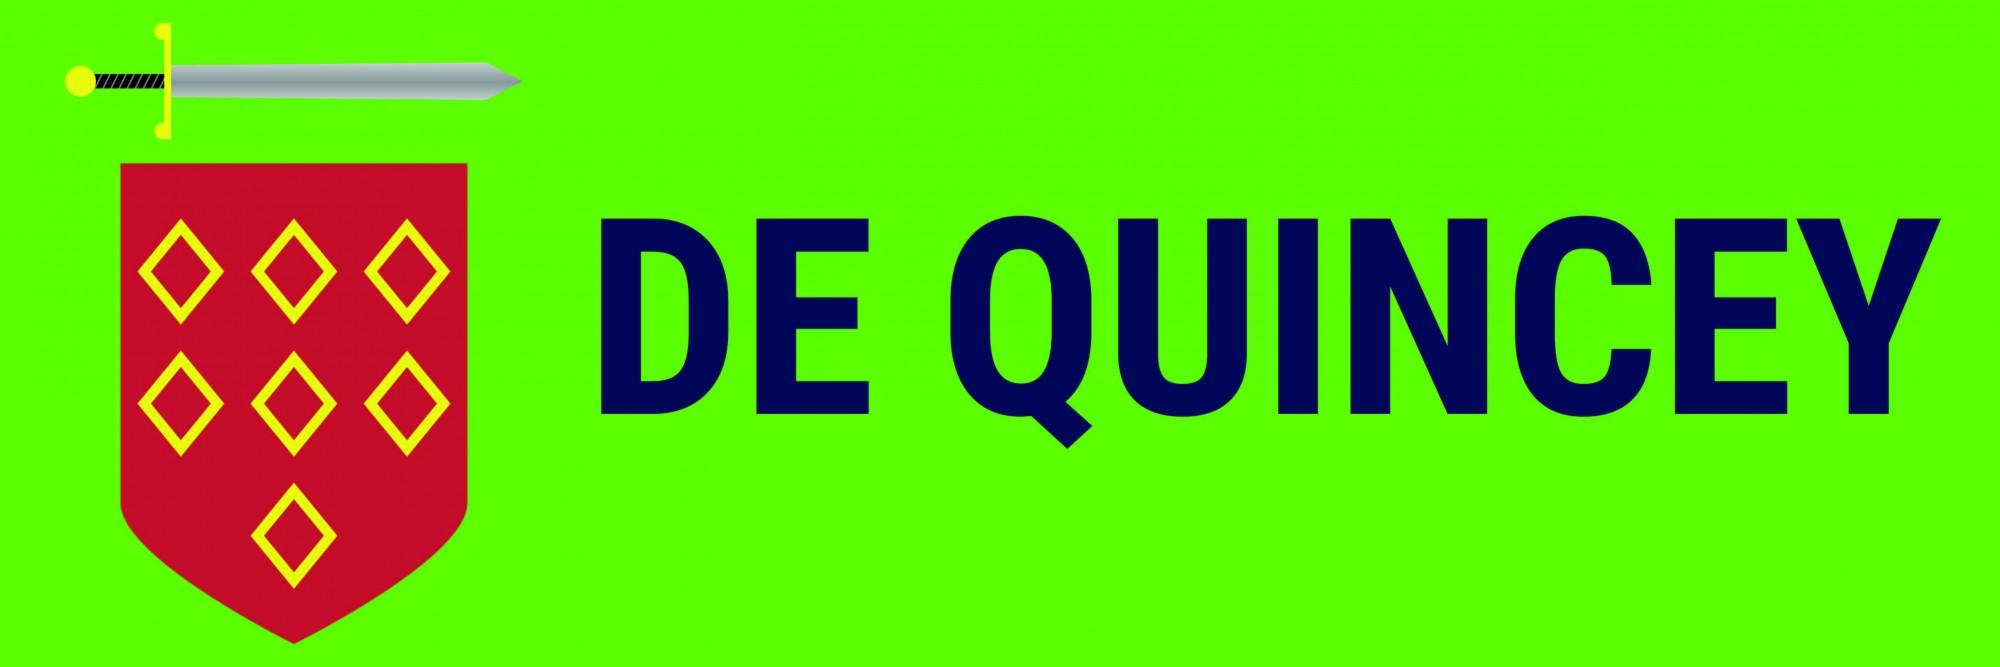 House Logo Designs De Quincey